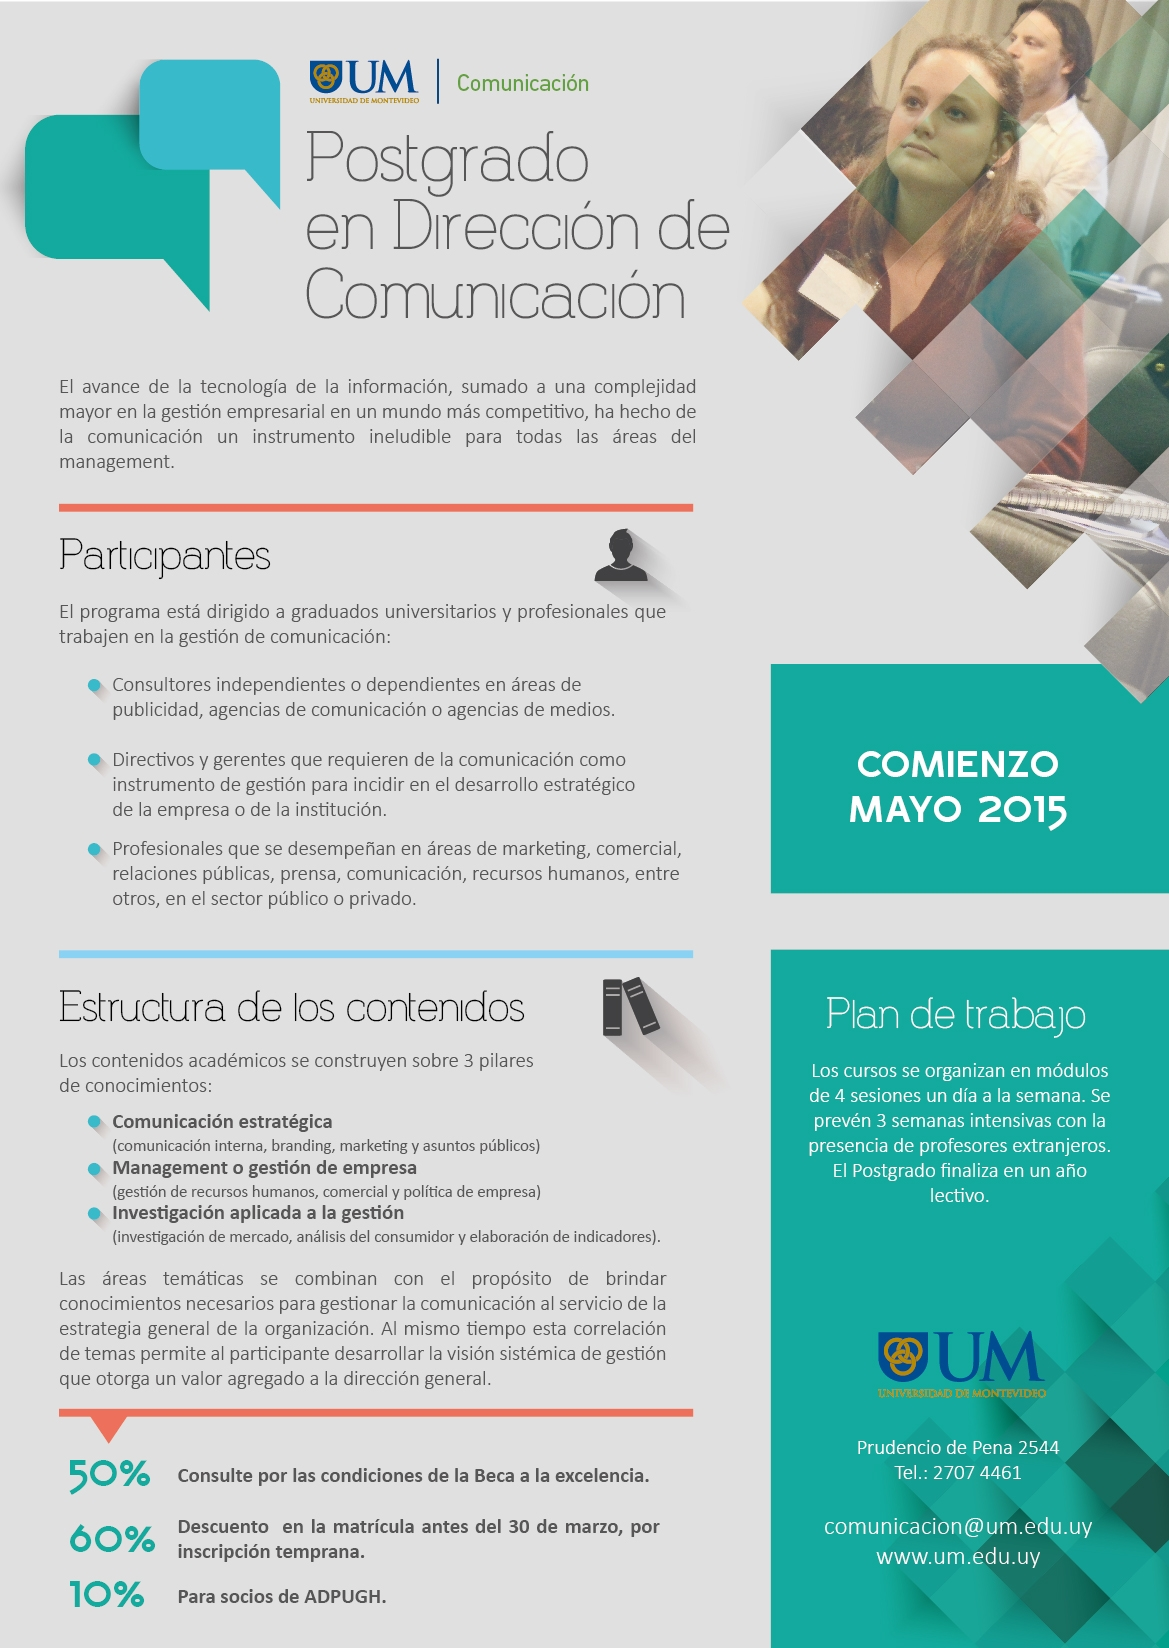 Newsletter-UM-Postgrado_2-01